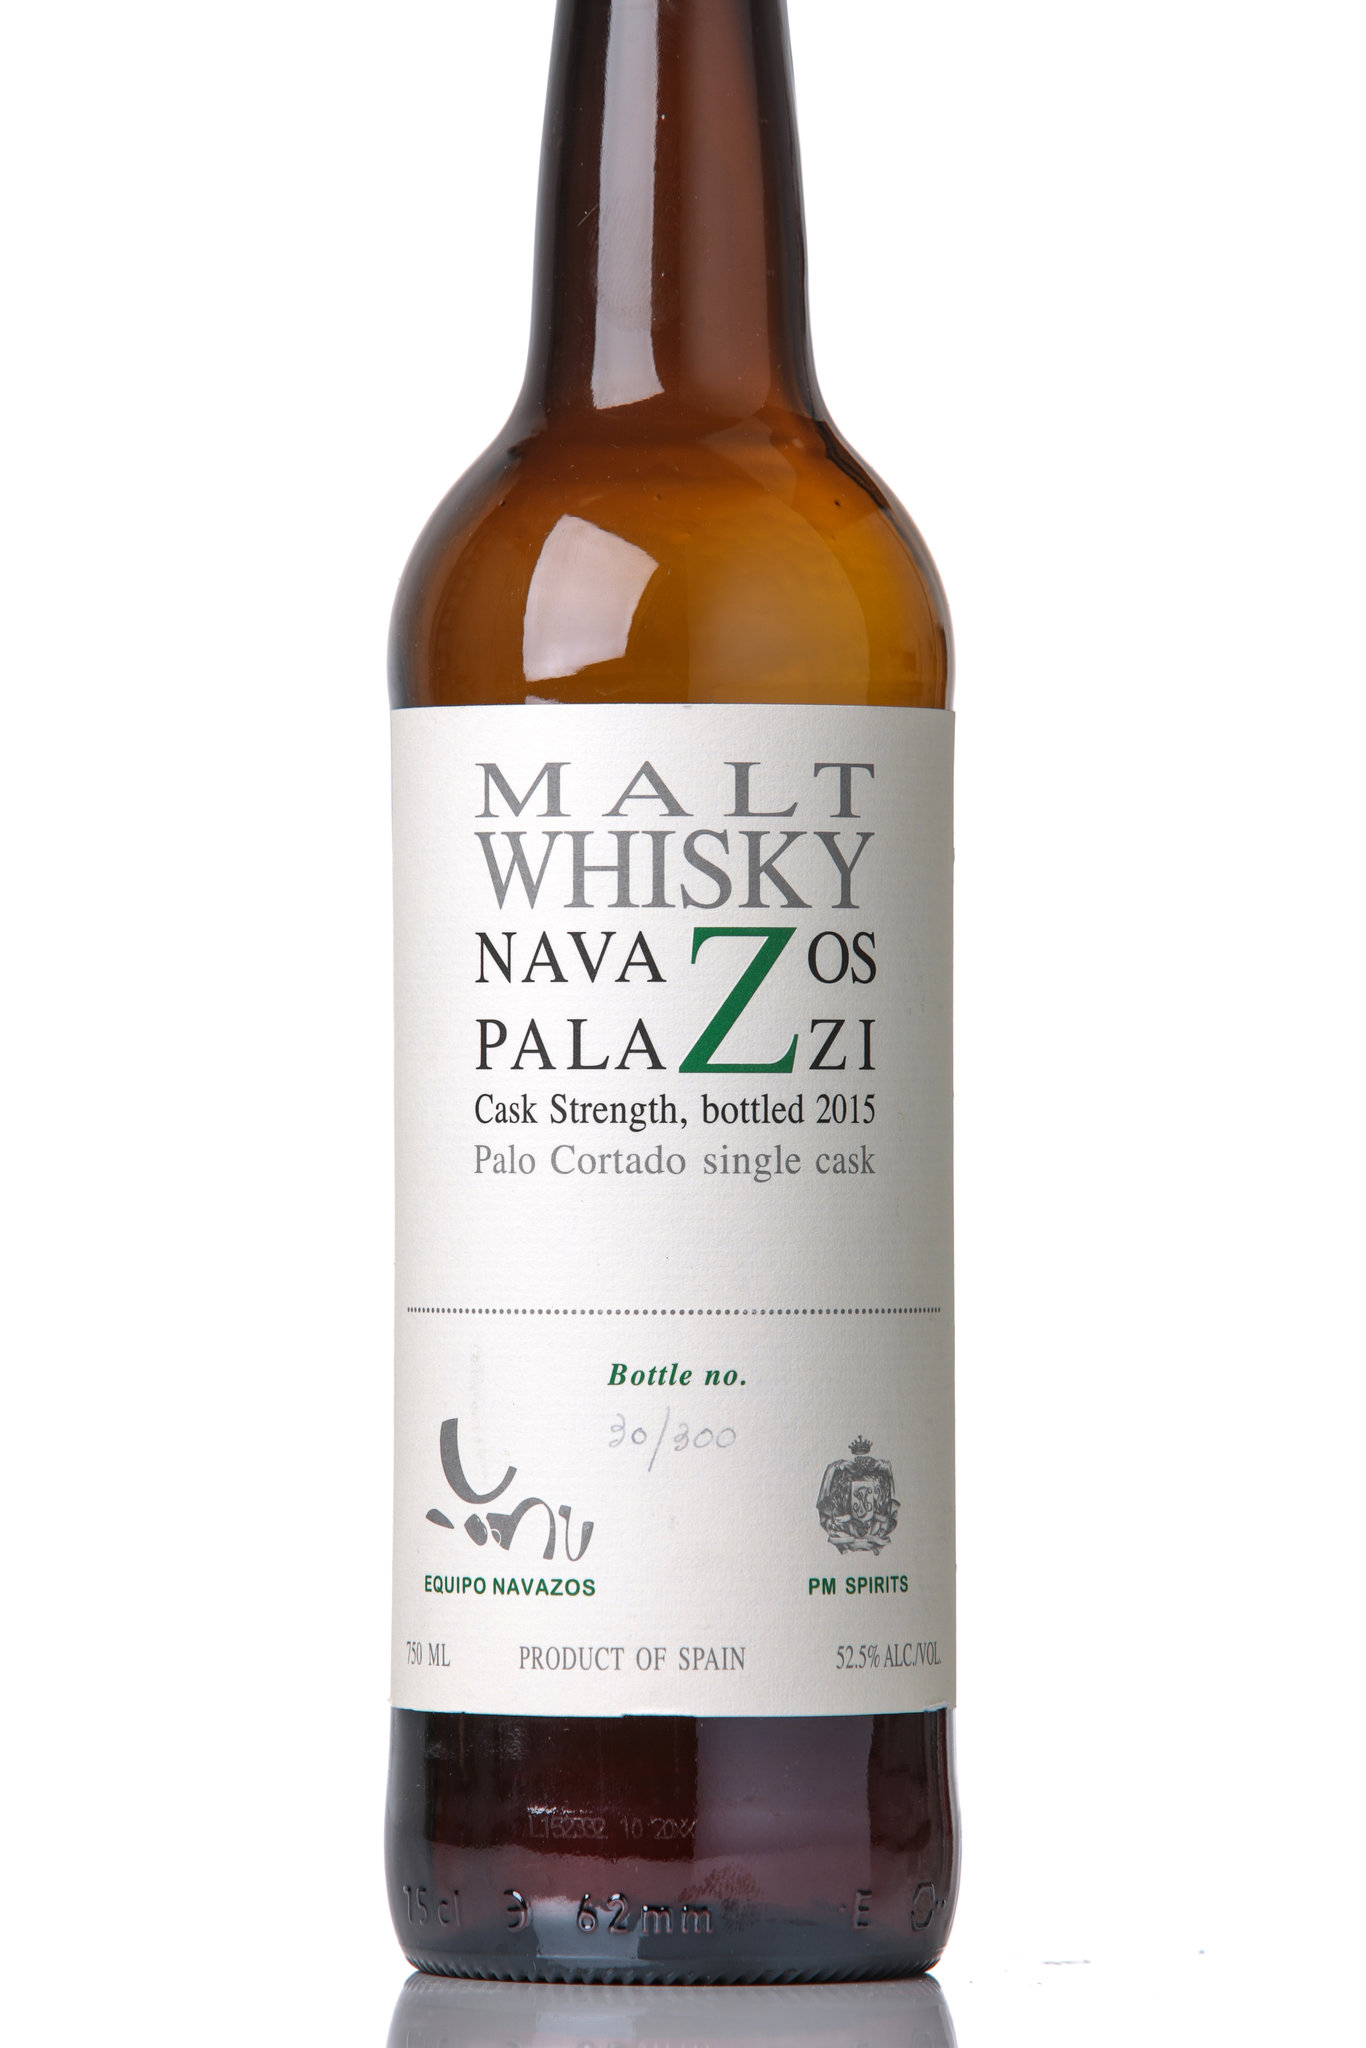 navazos_palazzi_malt_whisky